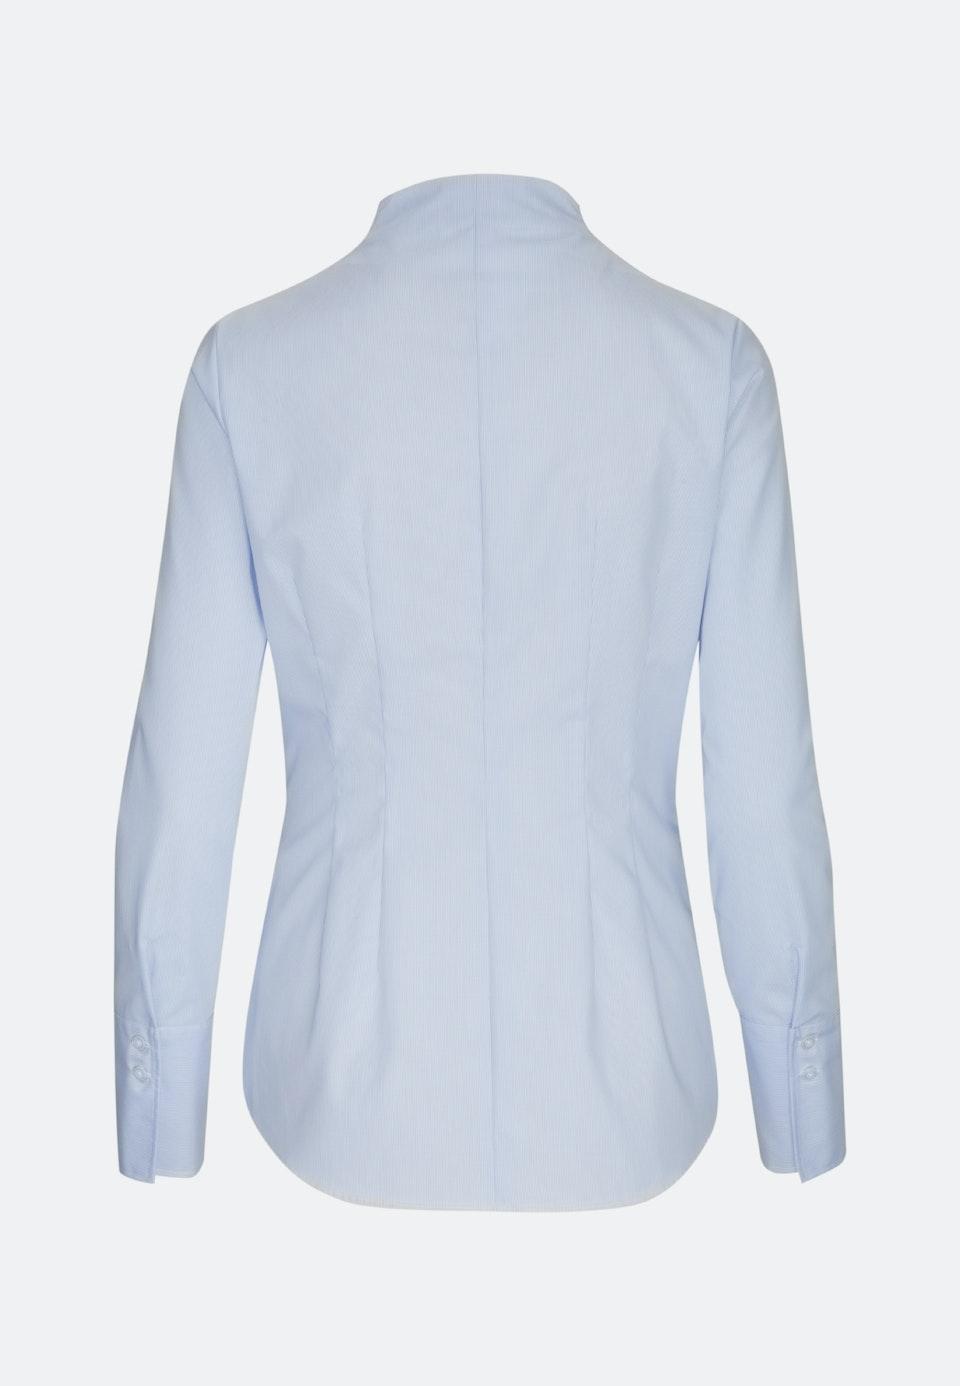 Non-iron Popeline Chalice Blouse made of 100% Cotton in Light blue |  Seidensticker Onlineshop